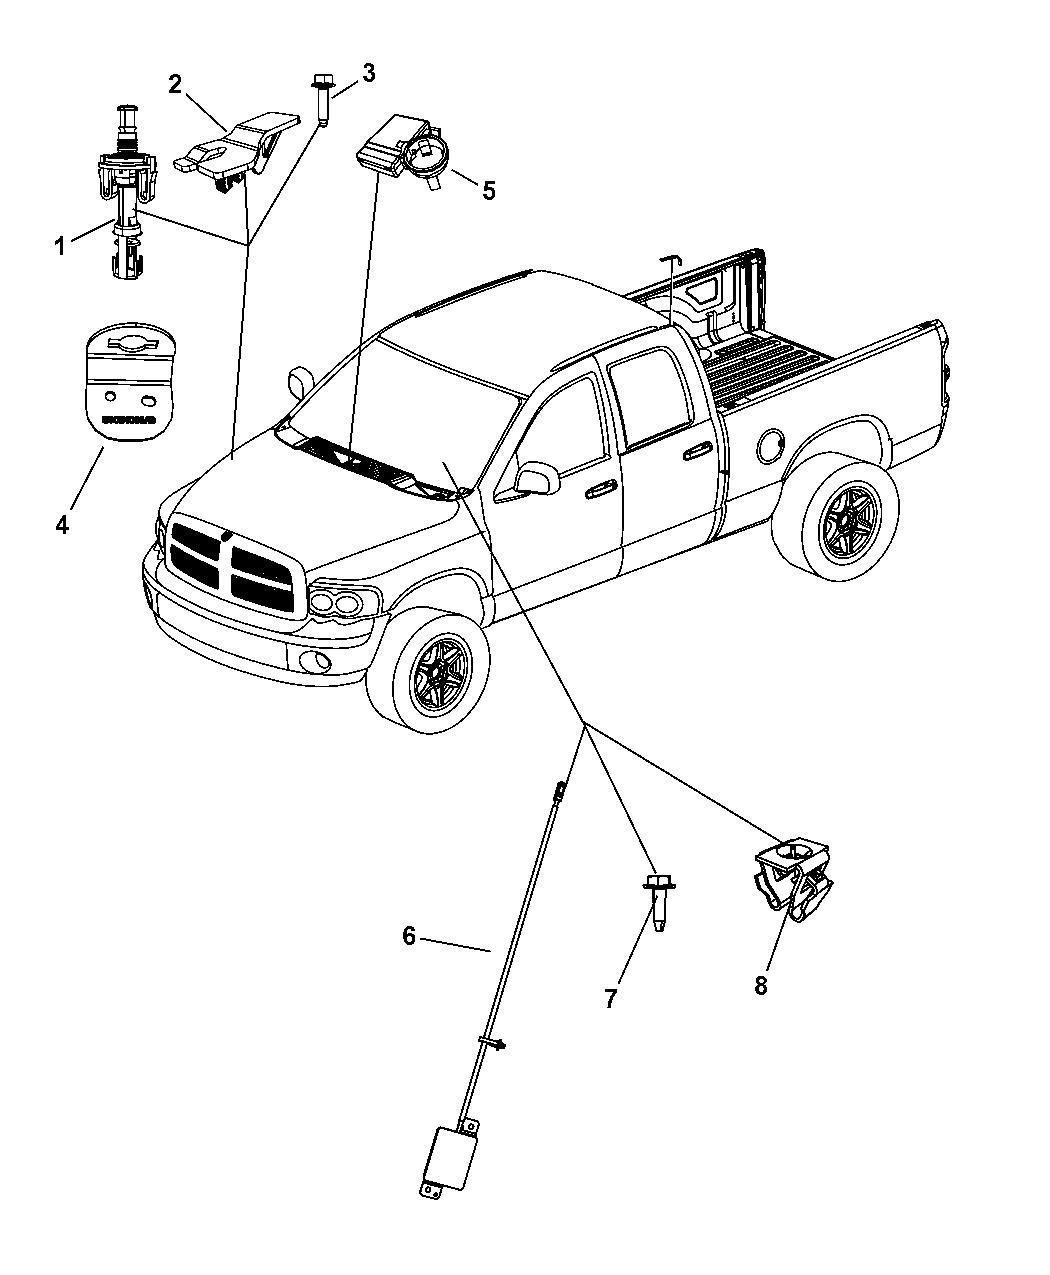 2008 Dodge Ram 3500 Pickup Starter, Remote Start